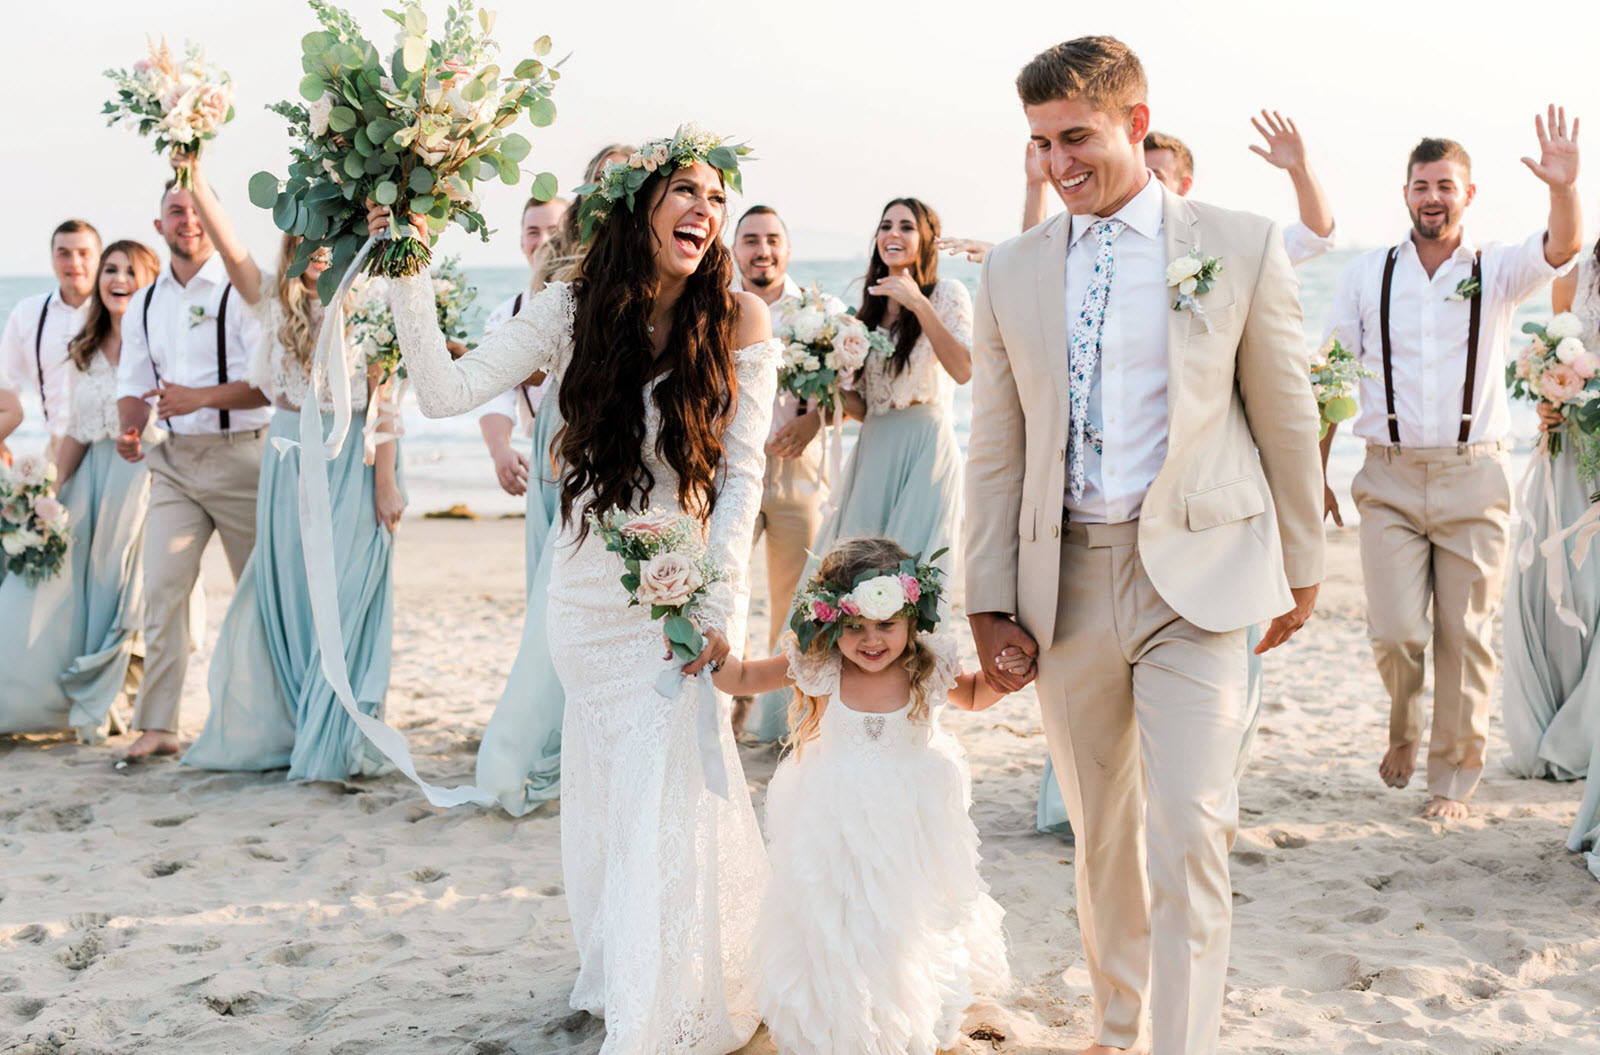 Santa Barbara Wedding Venue Rincon Beach Club Events By Rincon